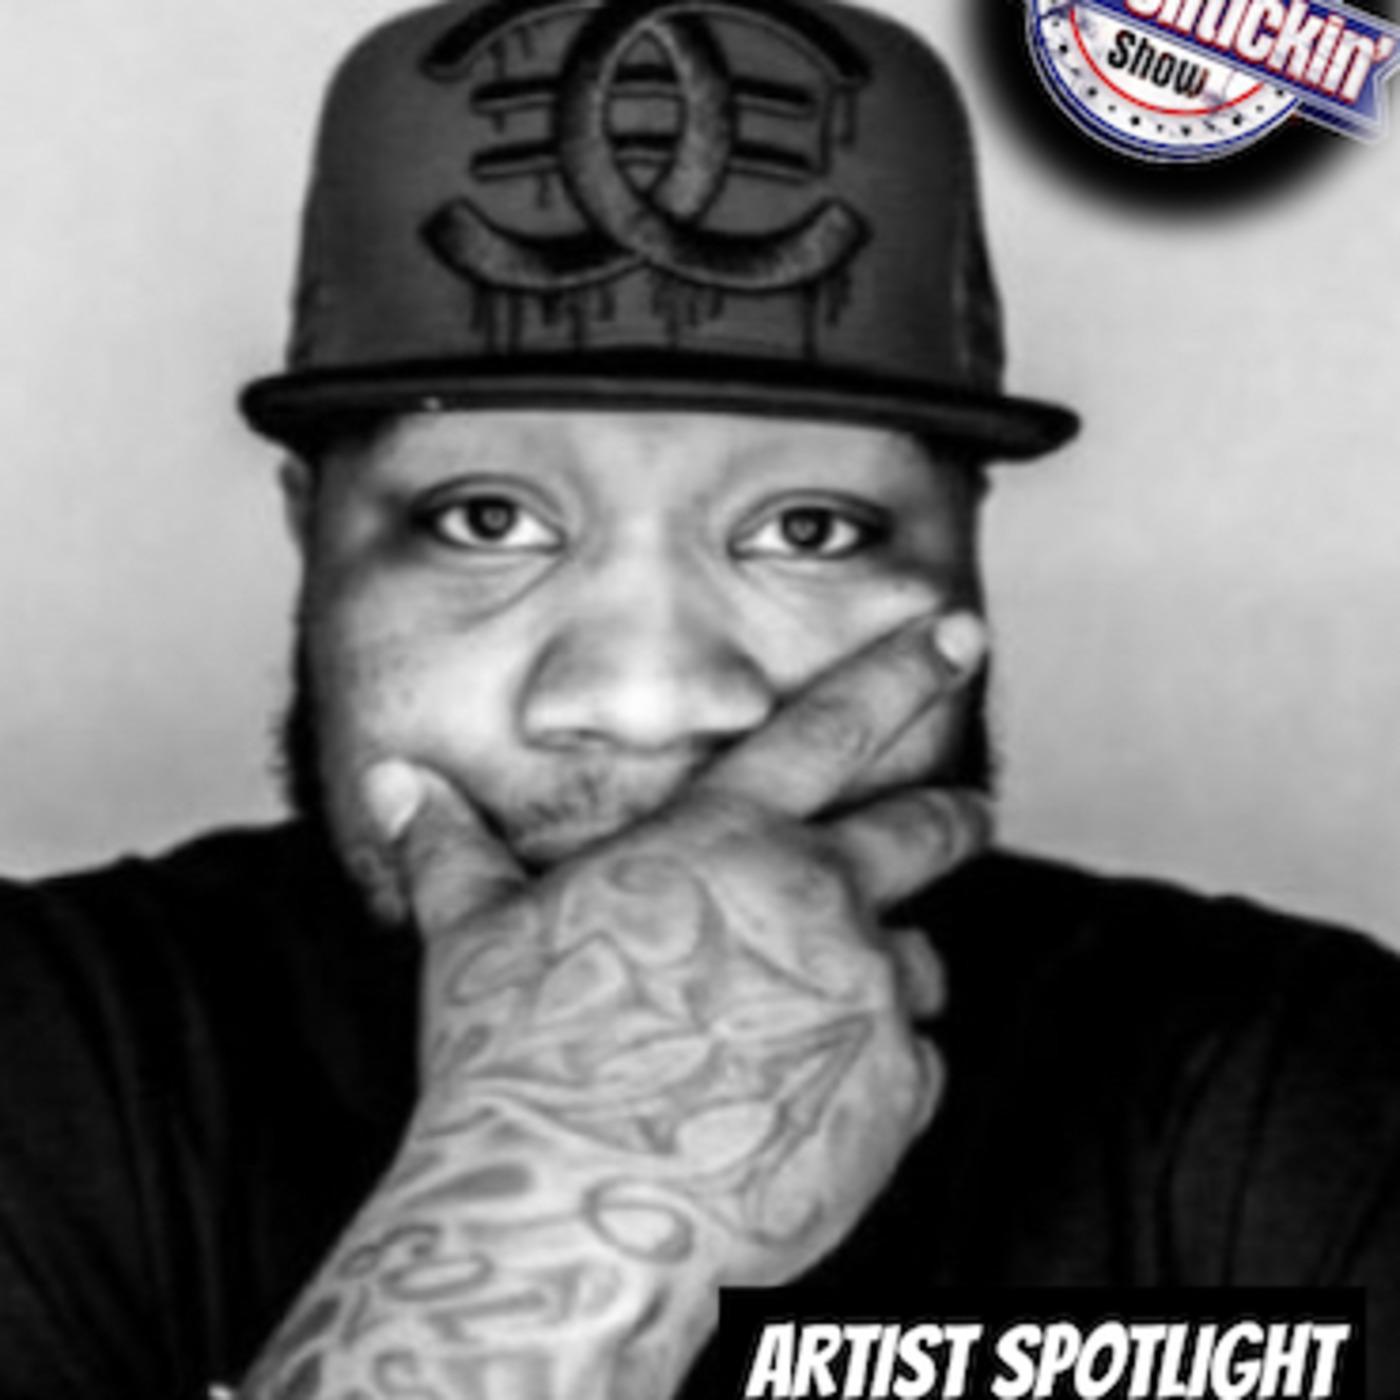 bfd5909a1eb Artist Spotlight - Rapper Big Pooh Pt 2